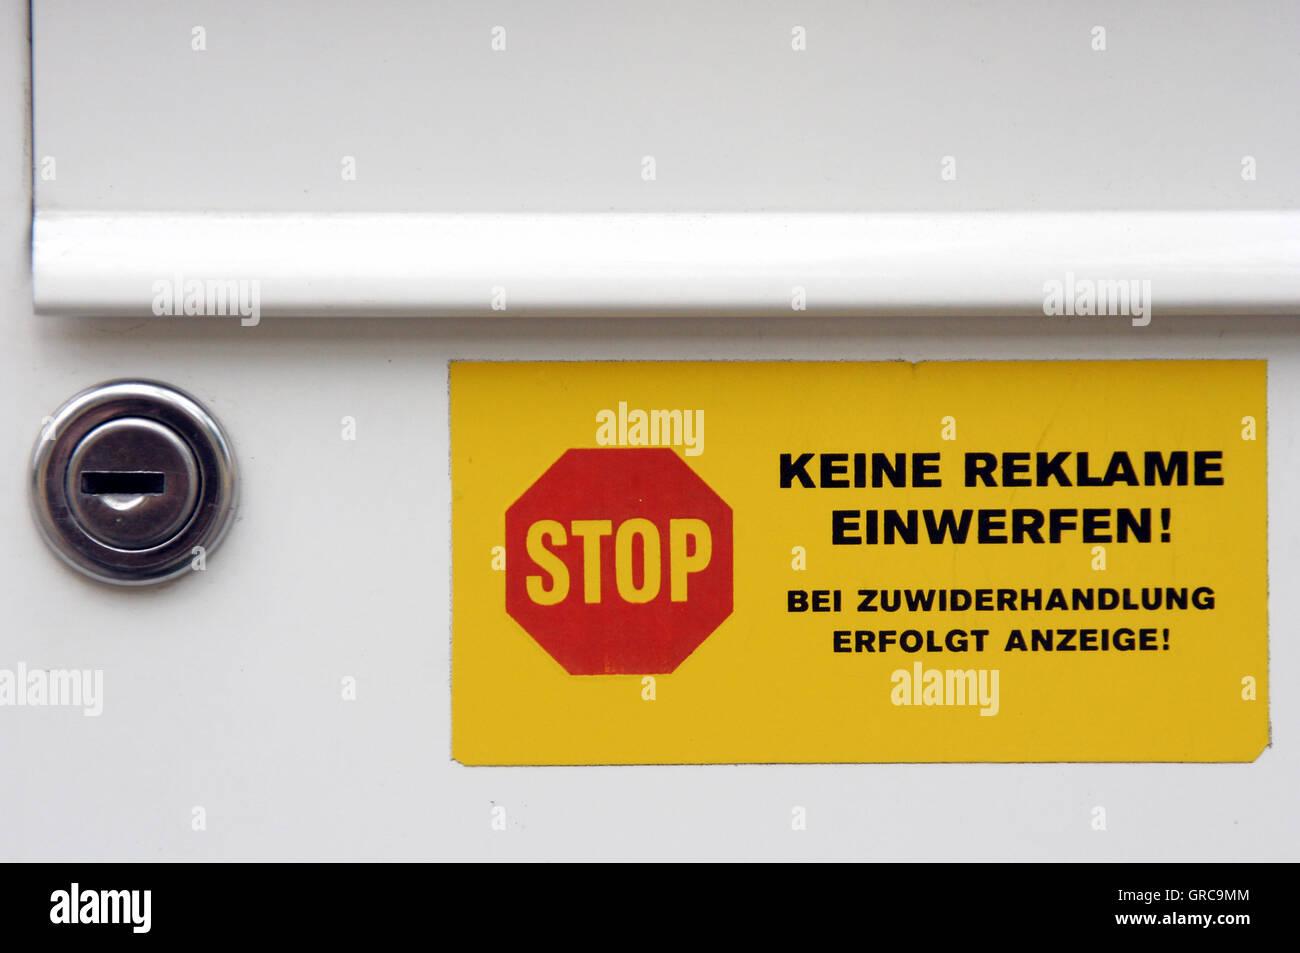 Sticker No Advertising - Stock Image